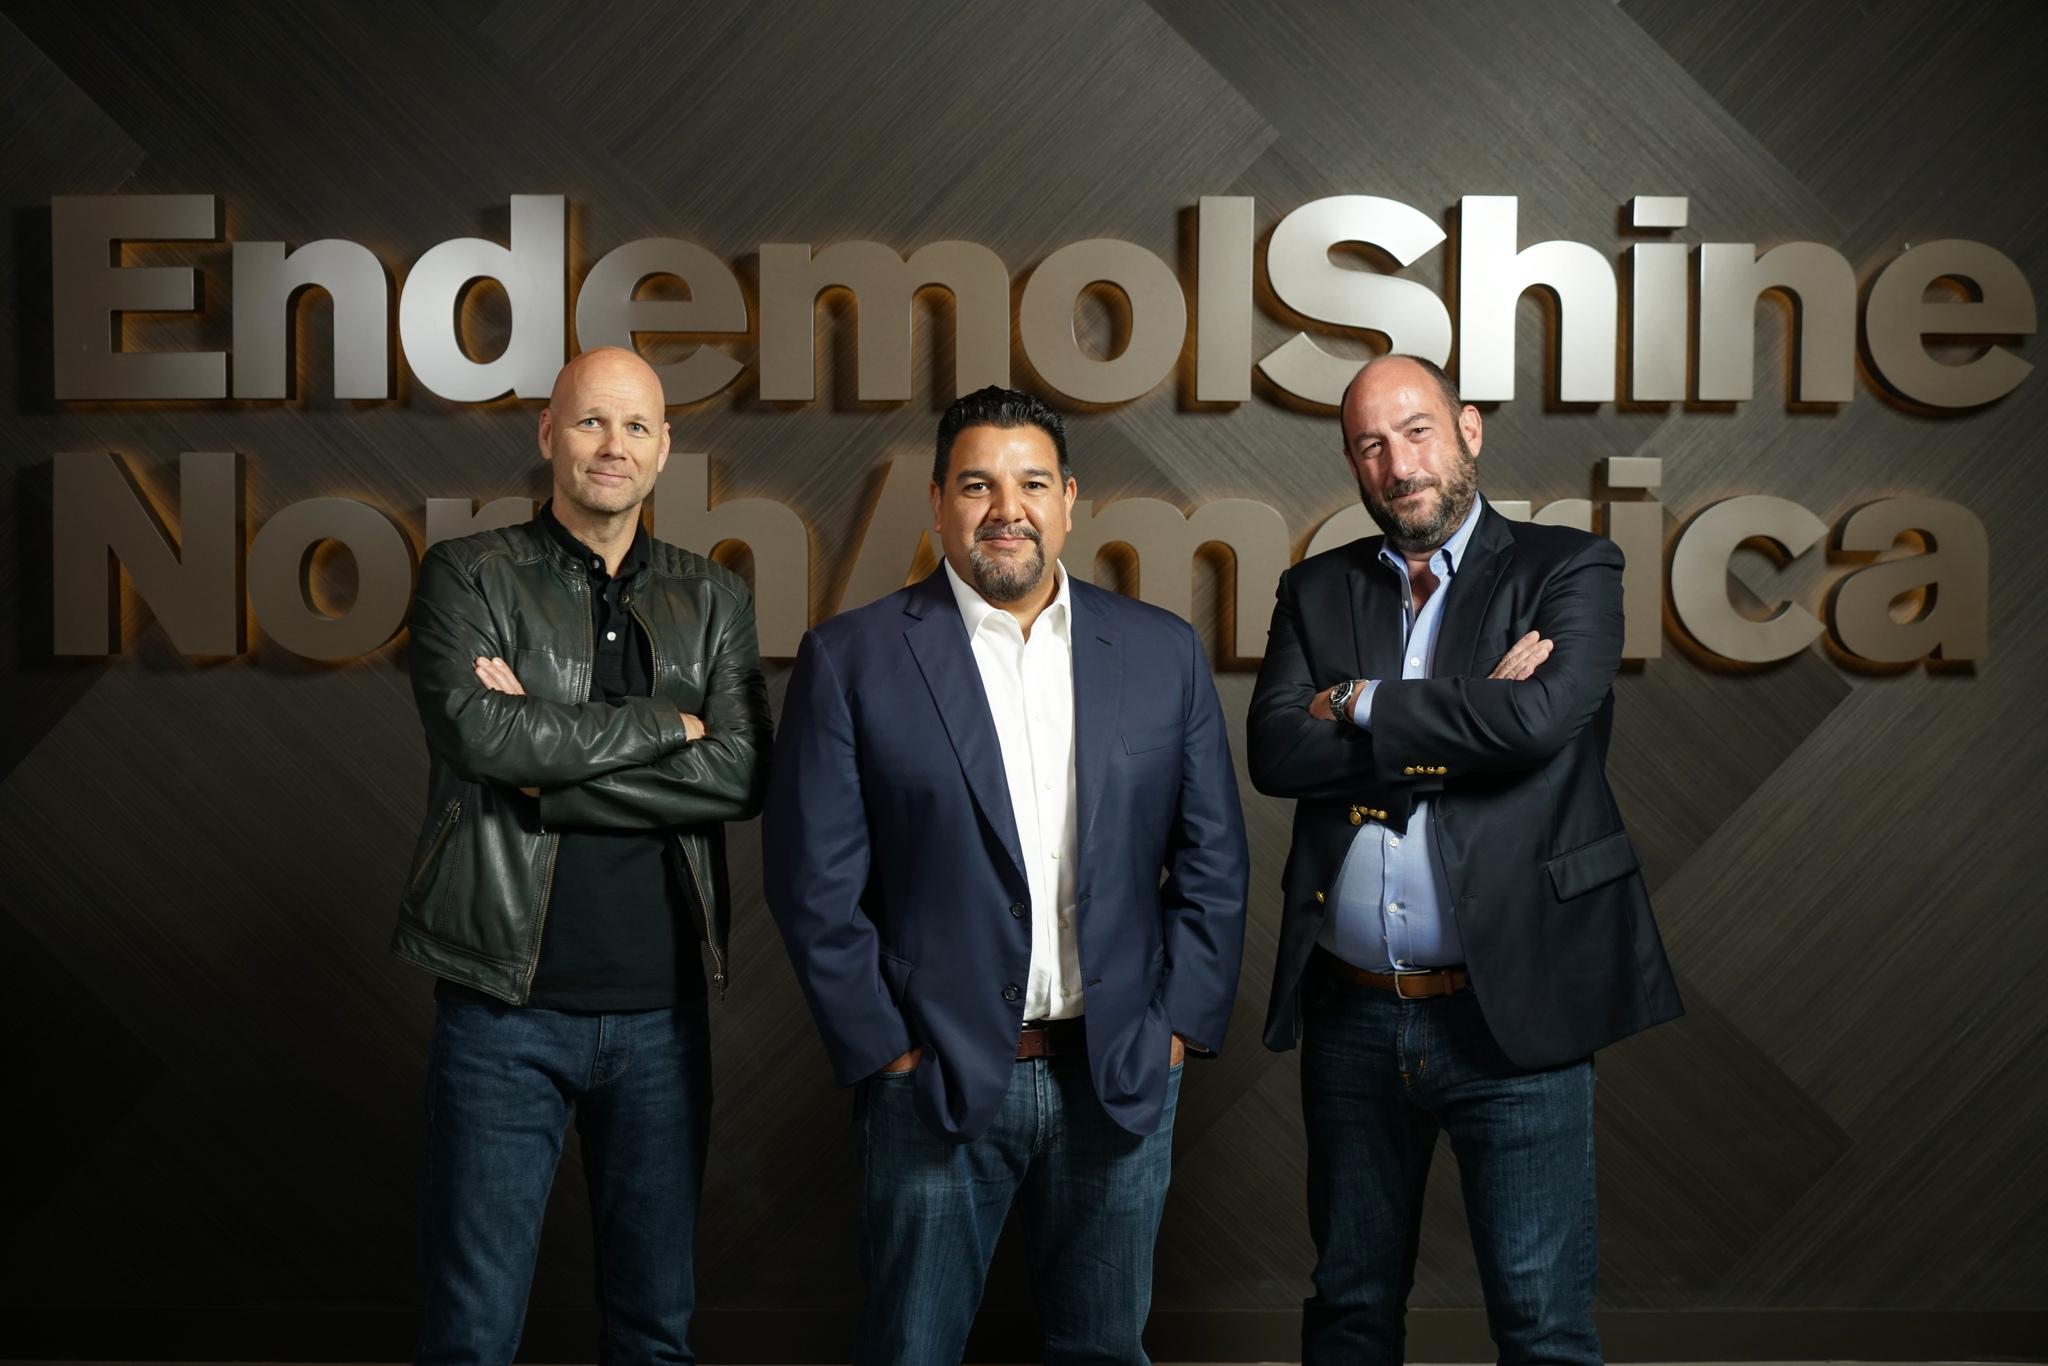 Endemol Shine North America & Boomdog